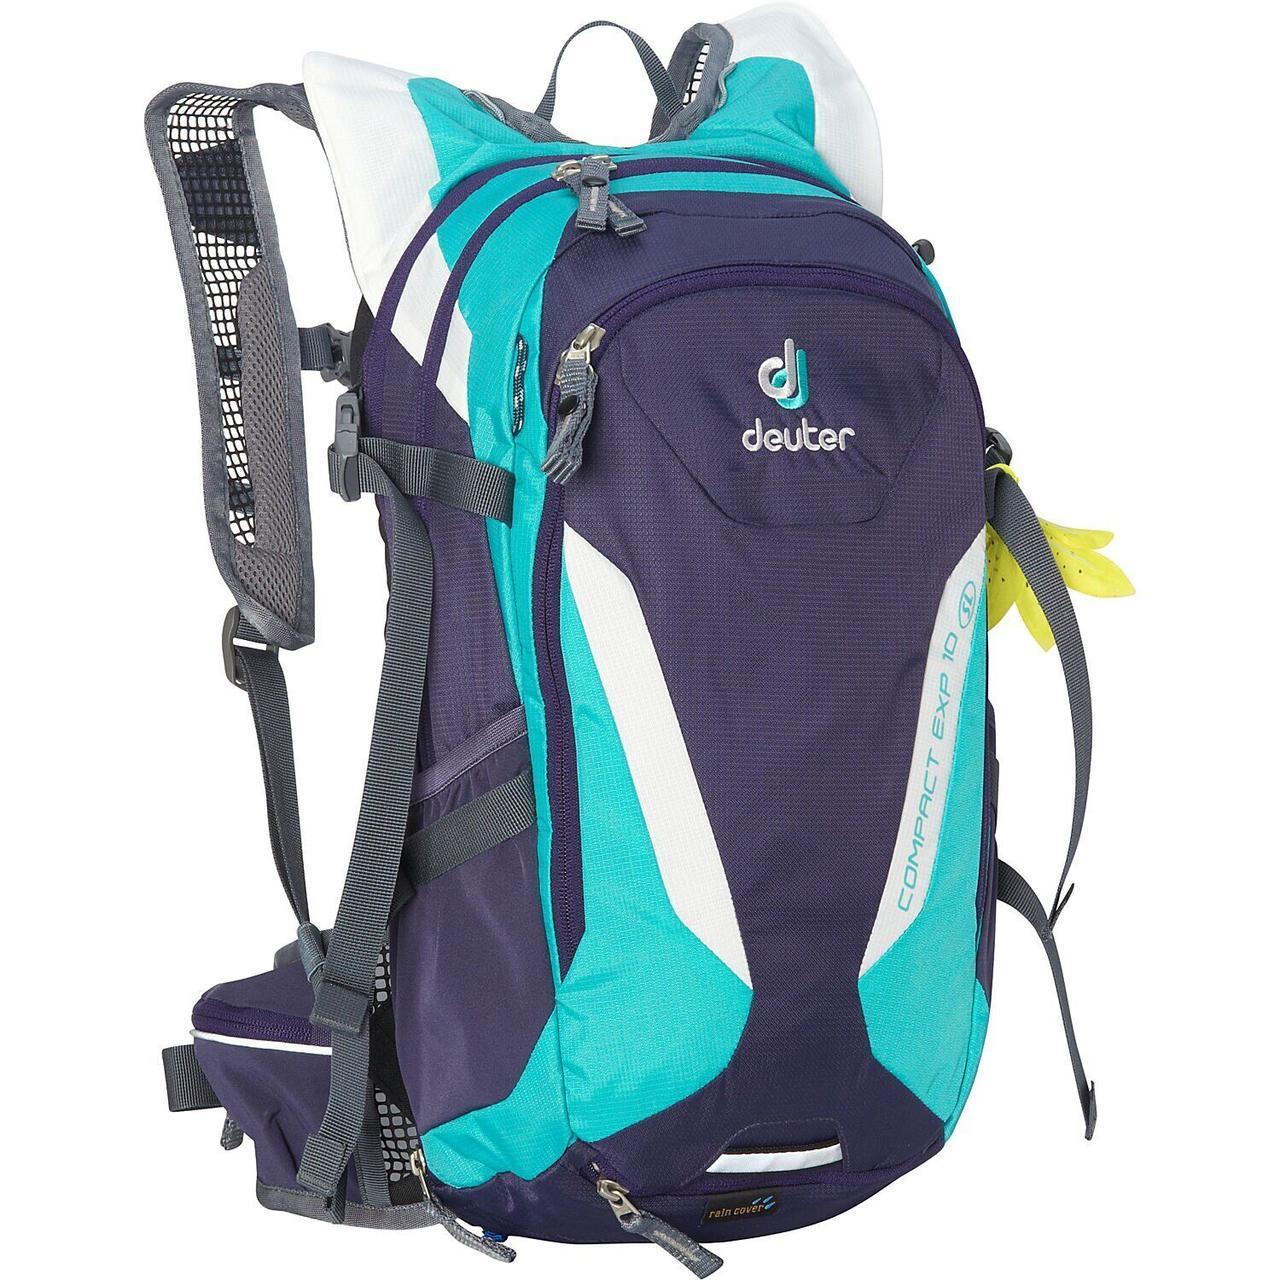 Велорюкзак Deuter Compact EXP 10 SL blueberry-mint (3200115 3207)